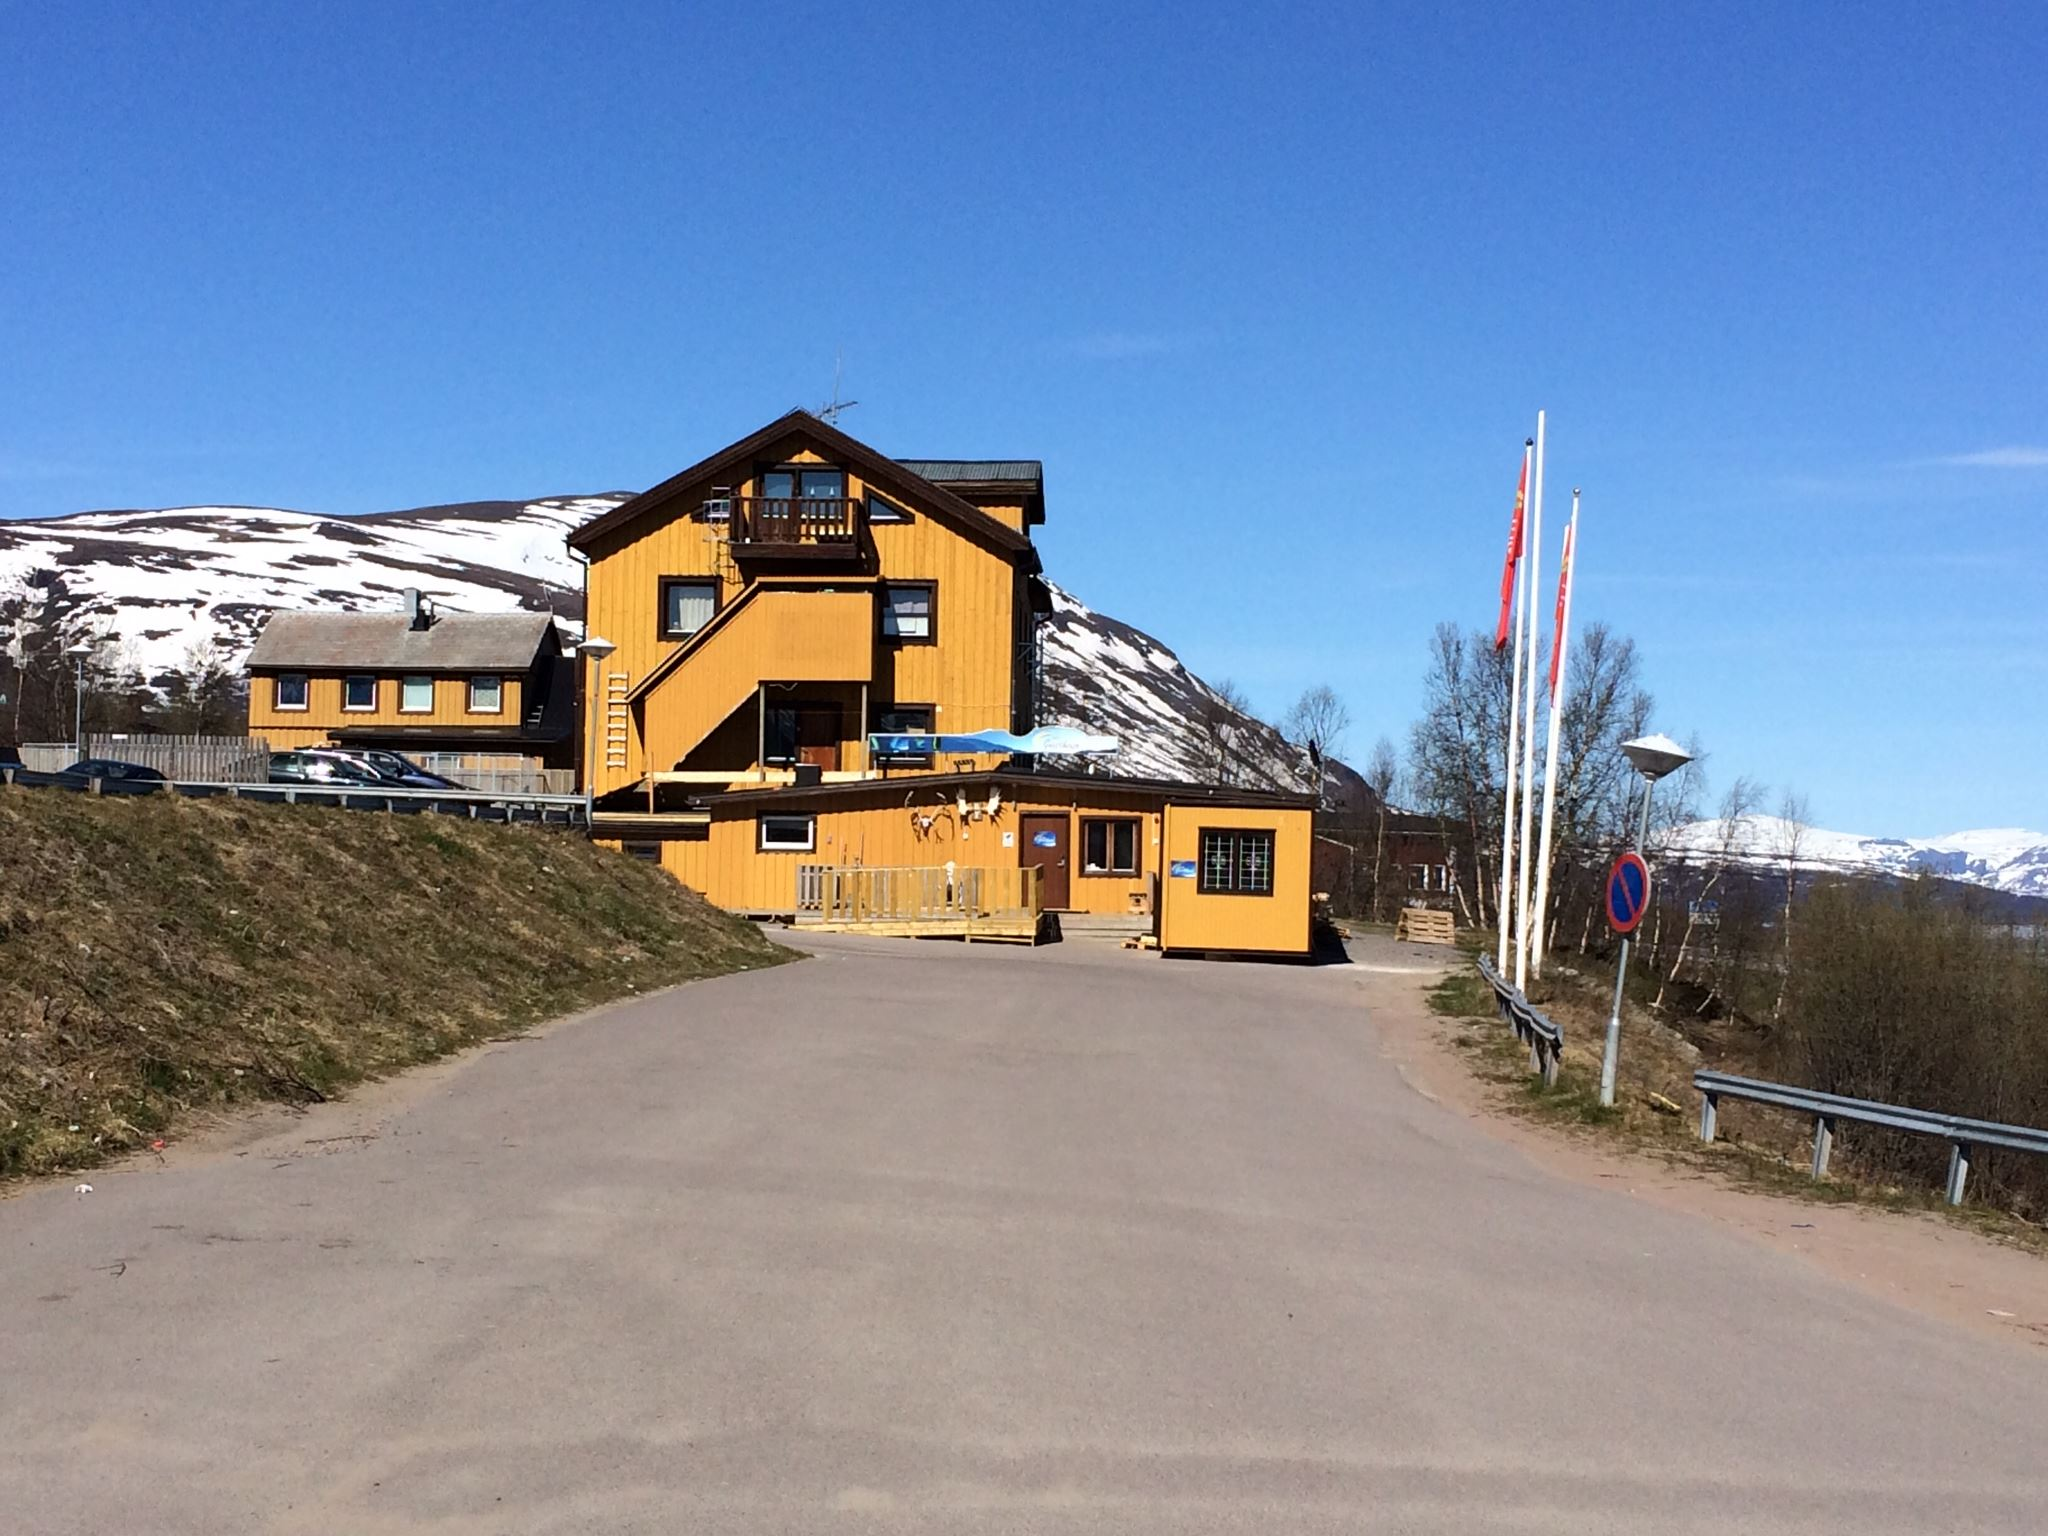 Abisko Guesthouse Hostel, SVIF